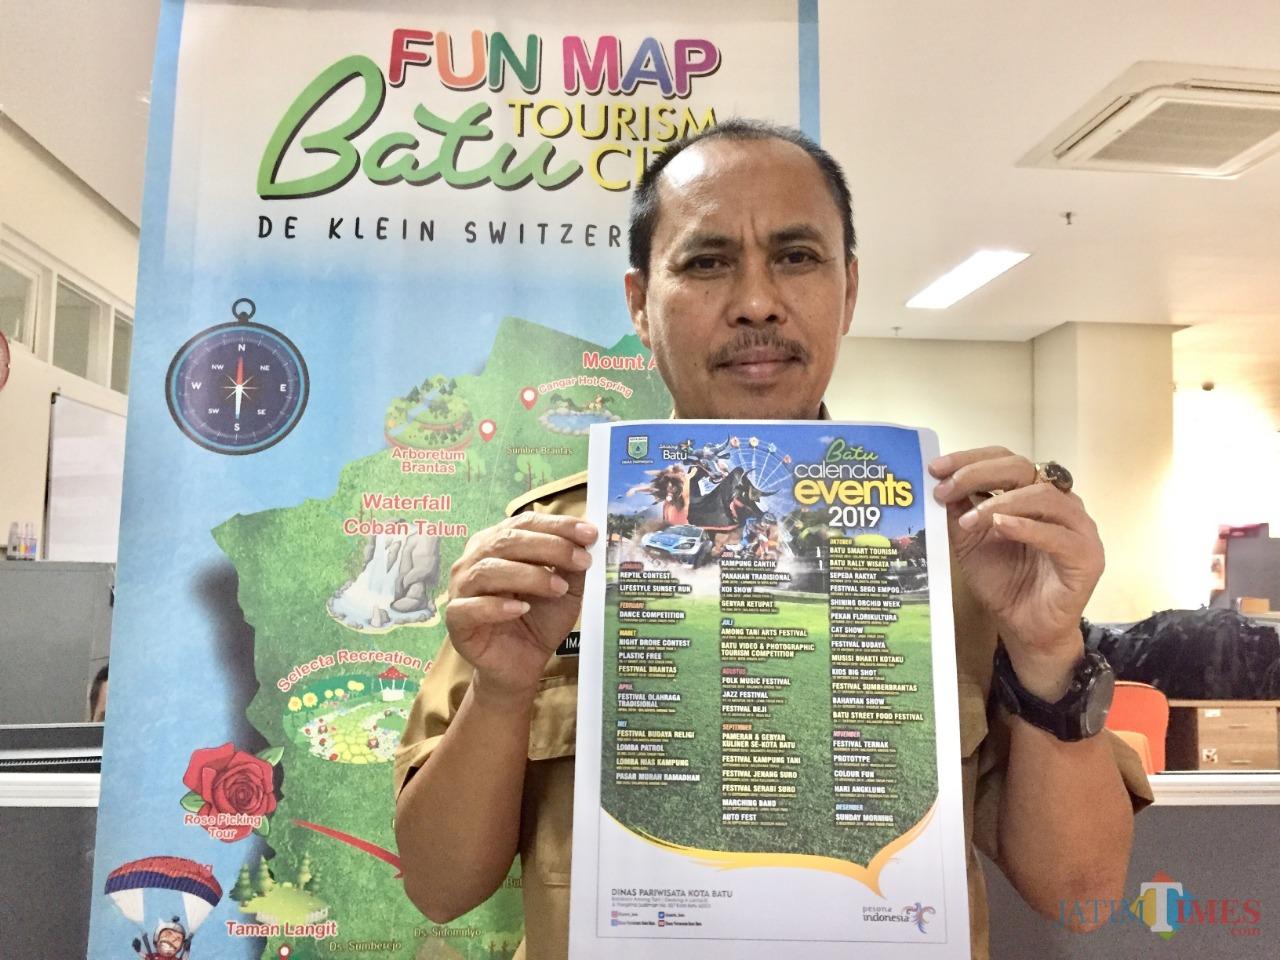 Plt Kepala Dinas Pariwisata Kota Batu Imam Suryono menunjukkan kalender even Kota Batu di kantornya Balai Kota Among Tani. (Foto: Irsya Richa/MalangTIMES)